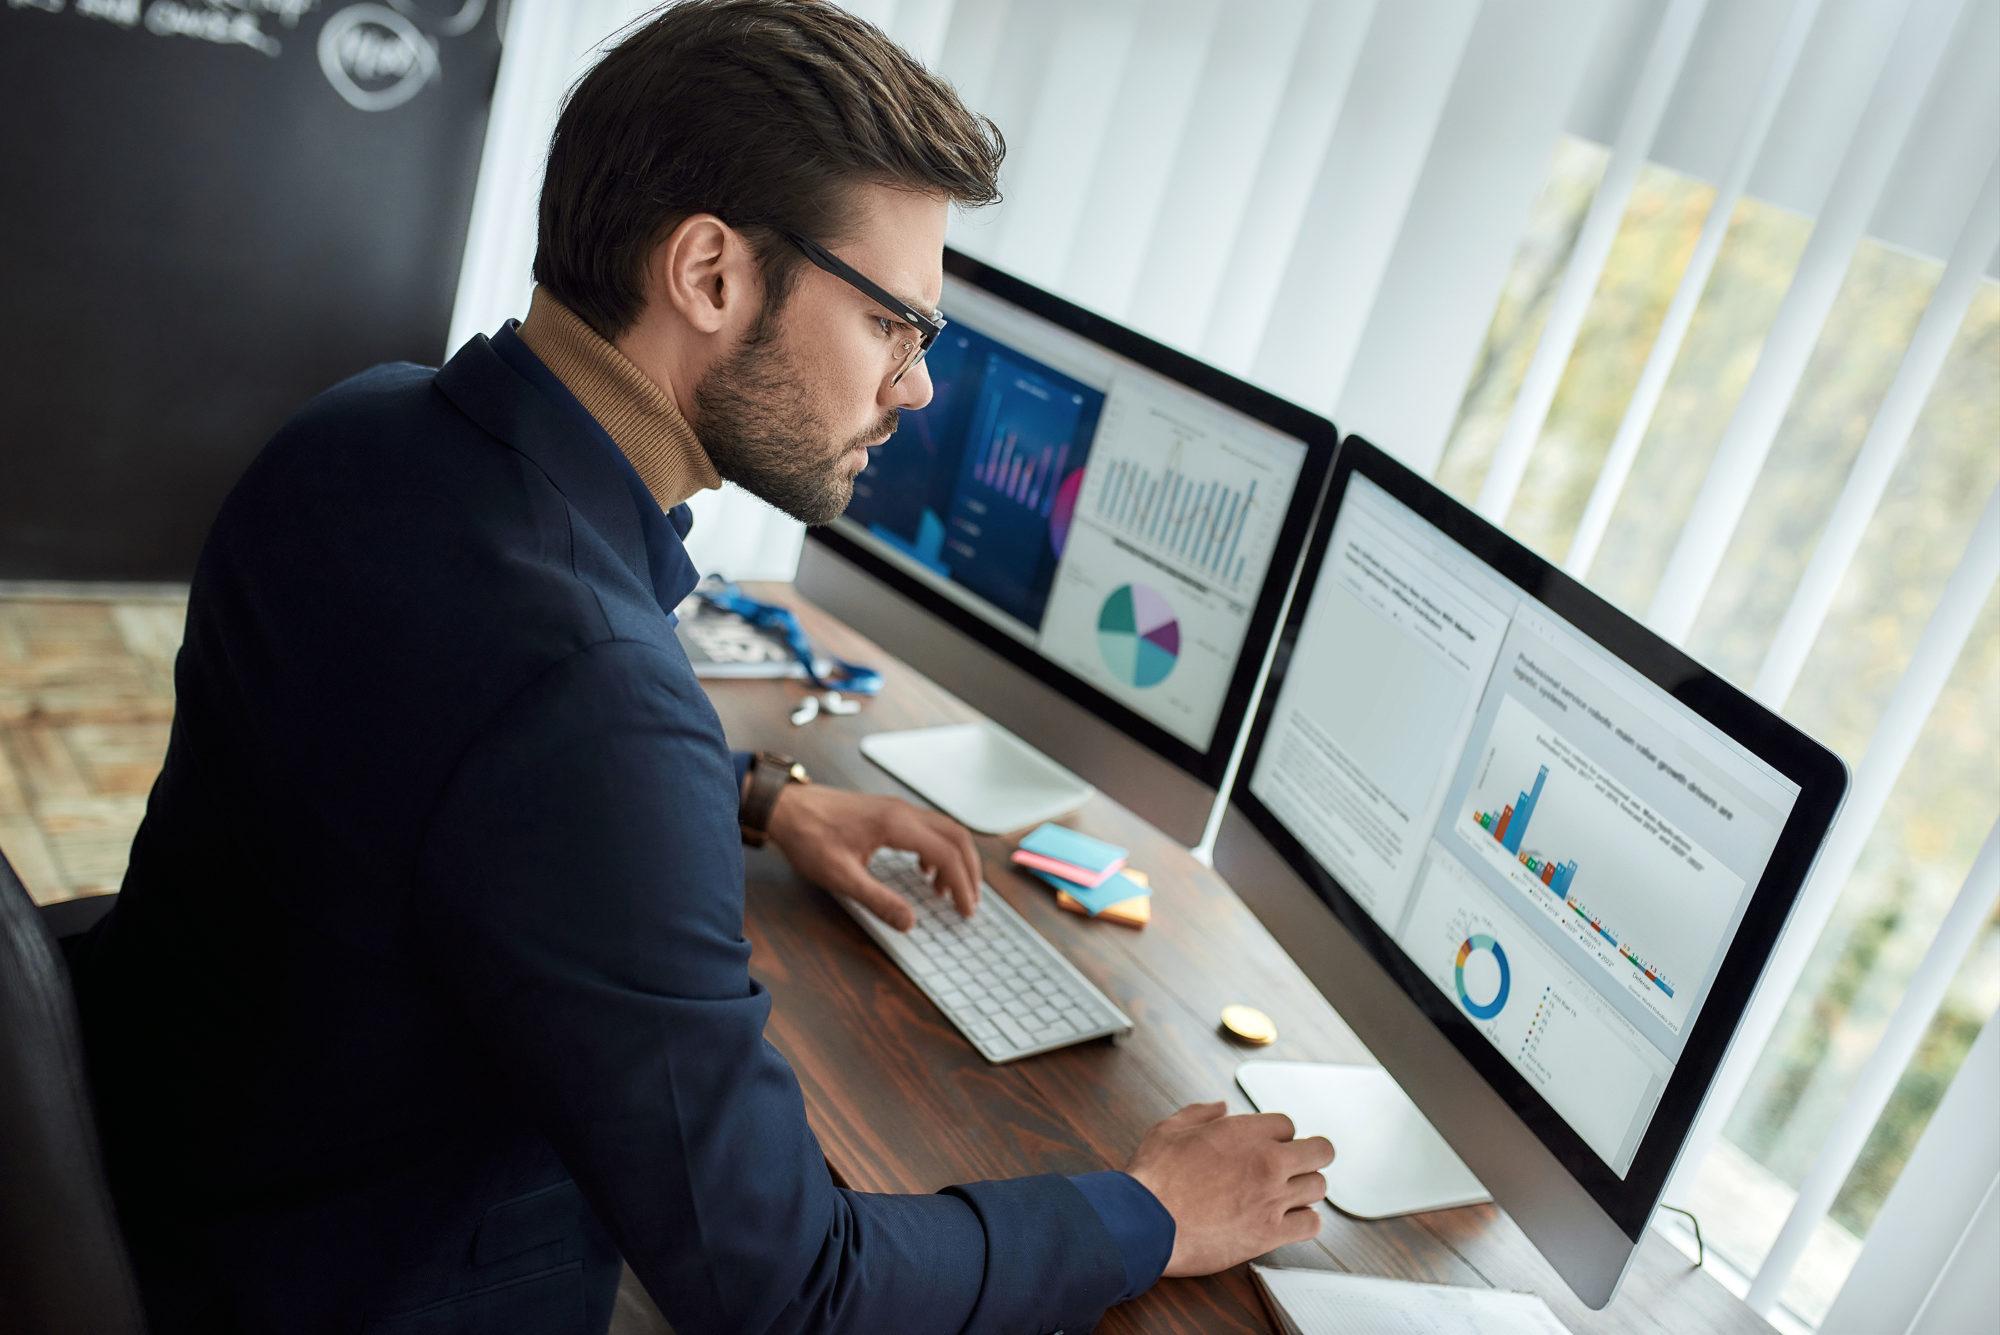 Does a Dual-Monitor Setup Improve Productivity?